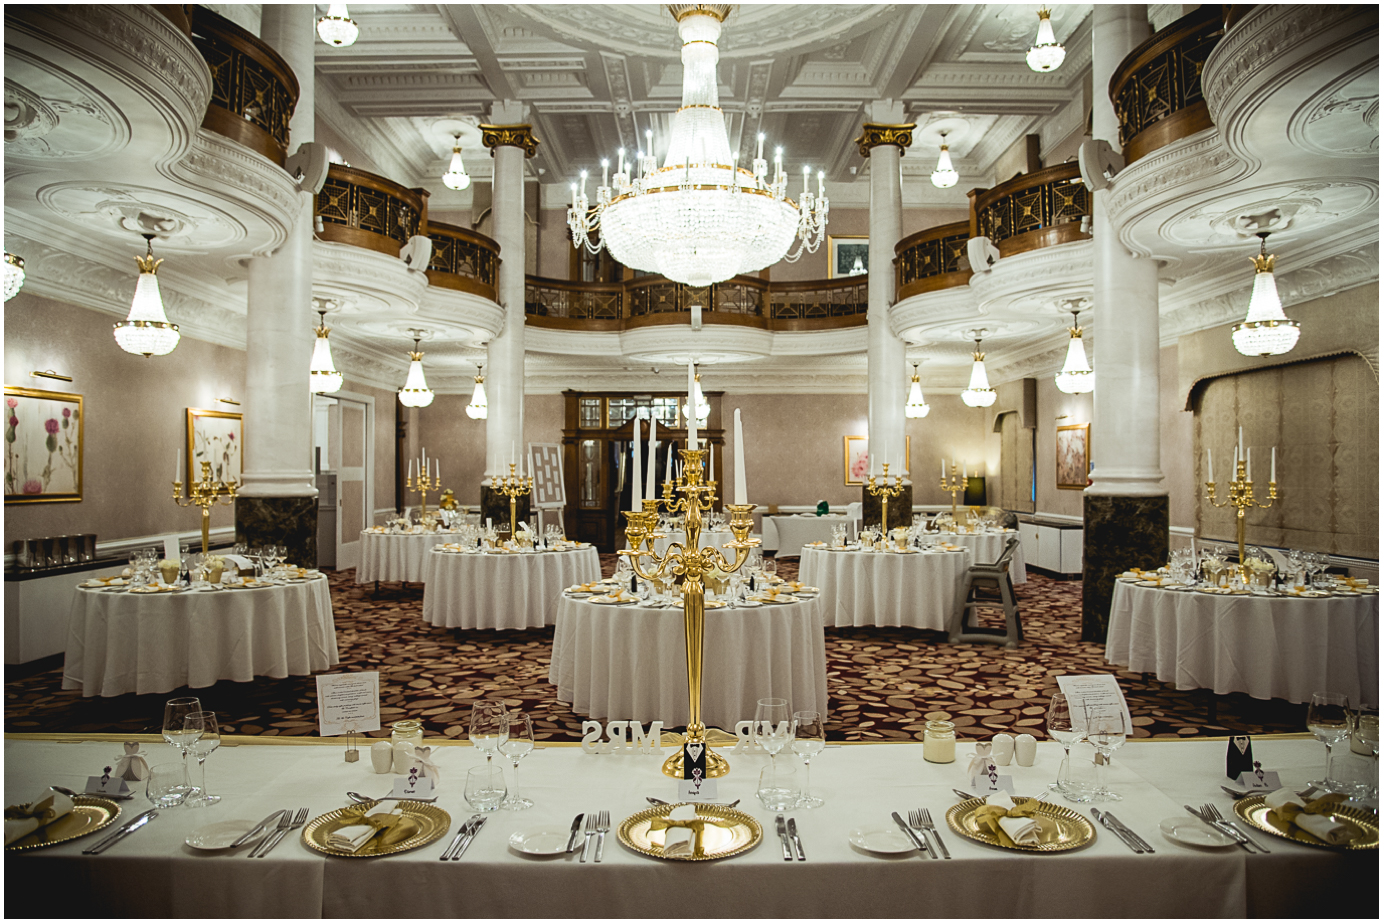 2 - Esmat and Angus - St. Ermin's Hotel London wedding photographer